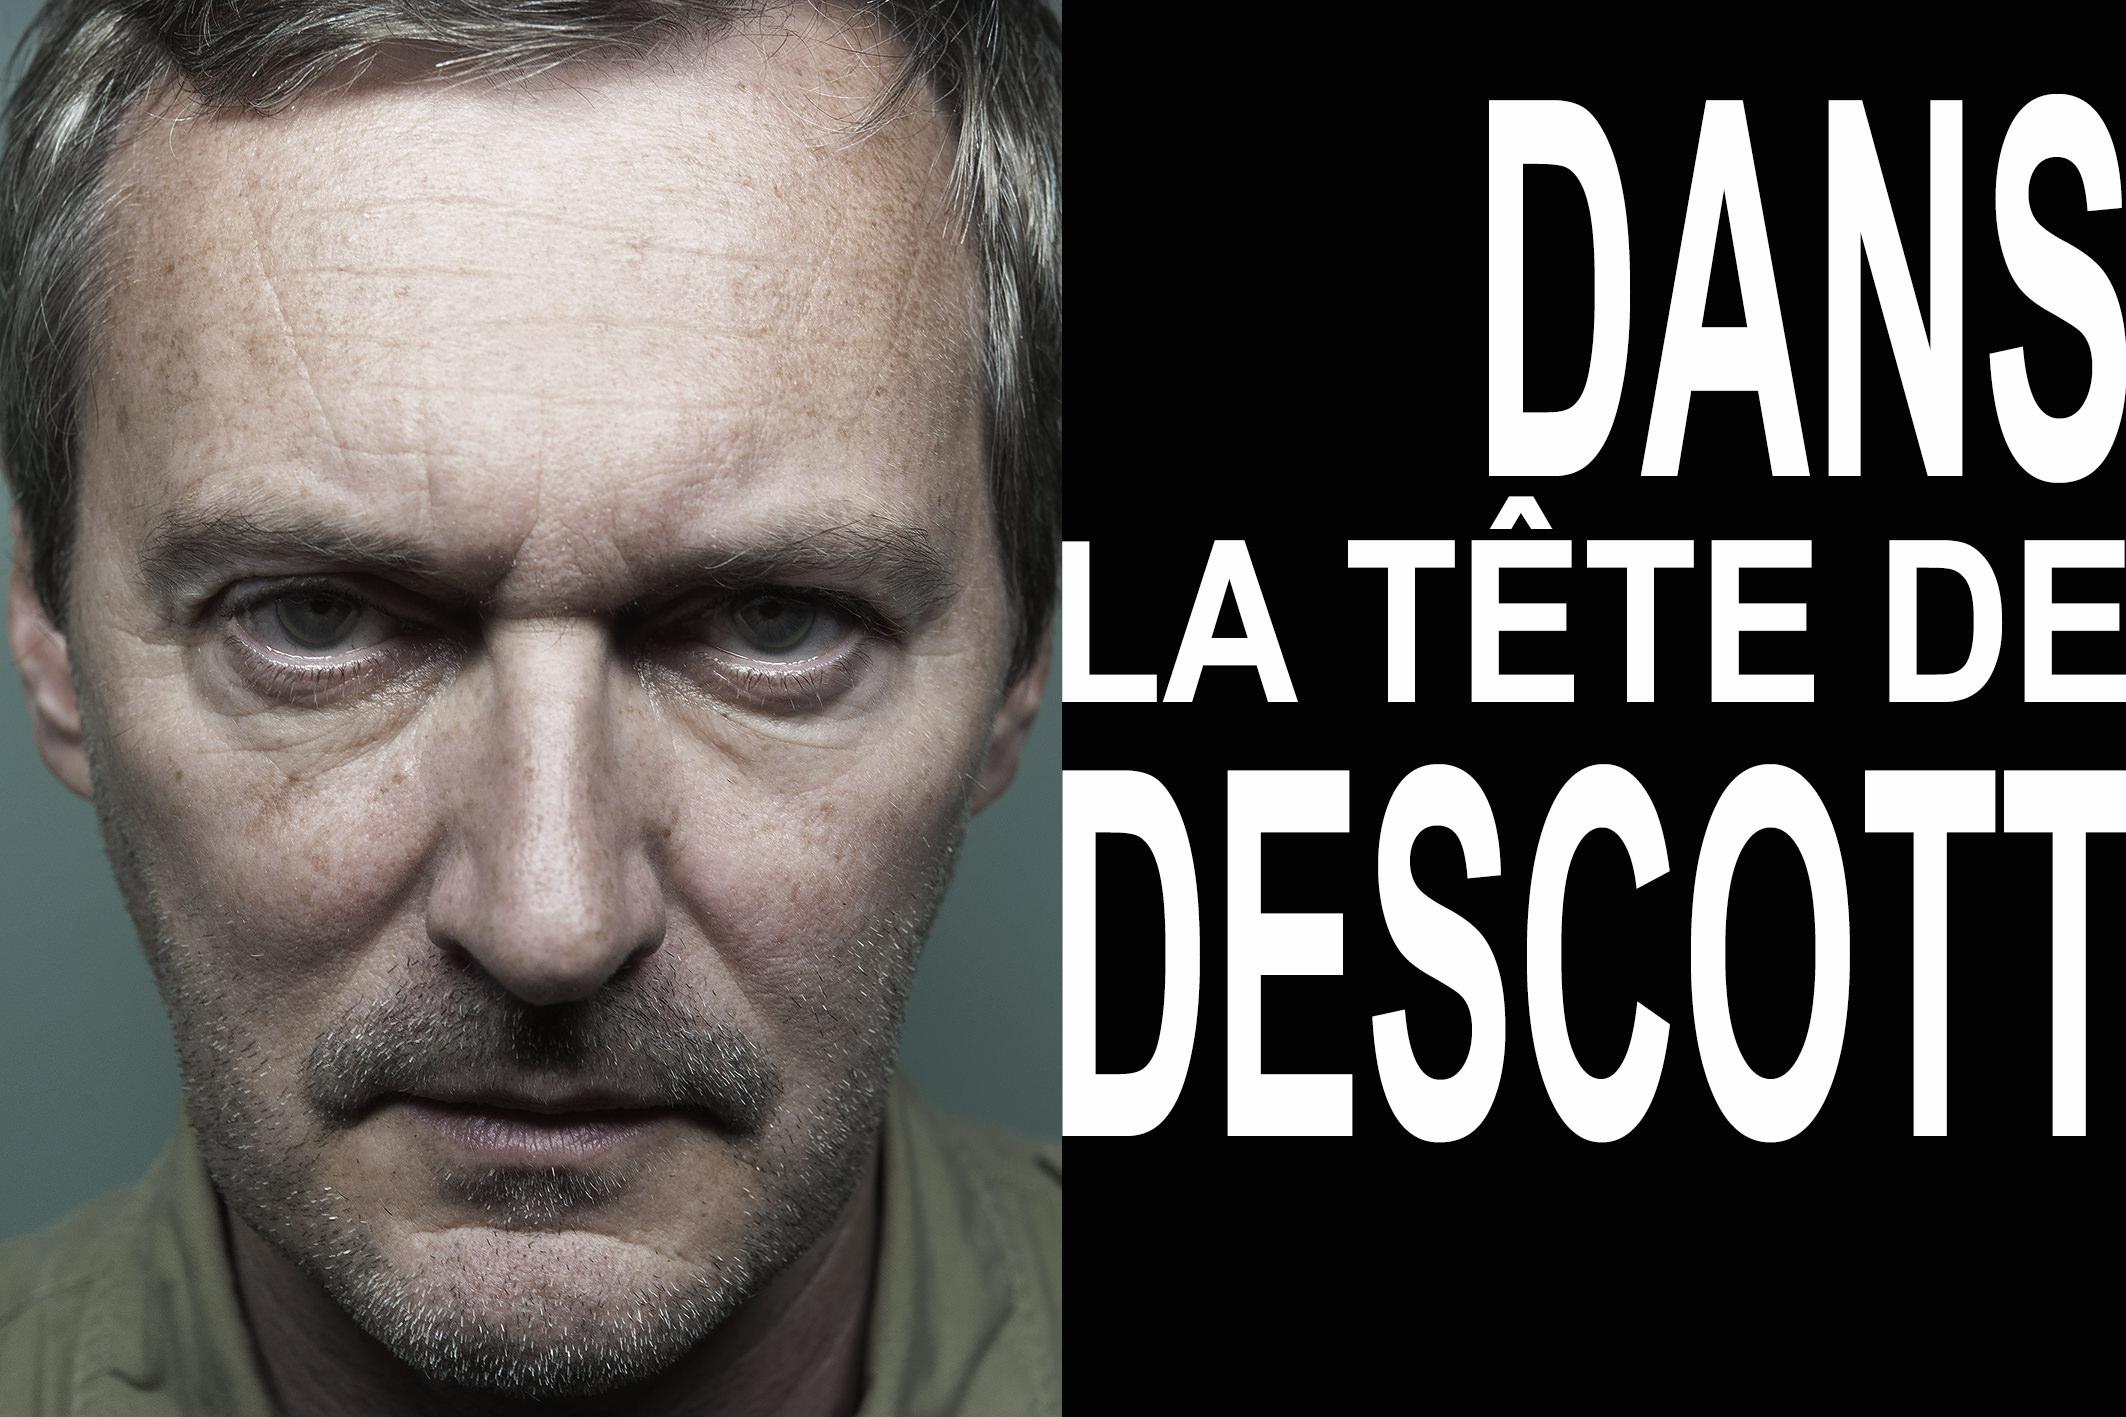 1-DS LA TETE DE DESCOTT 4.2.DEF